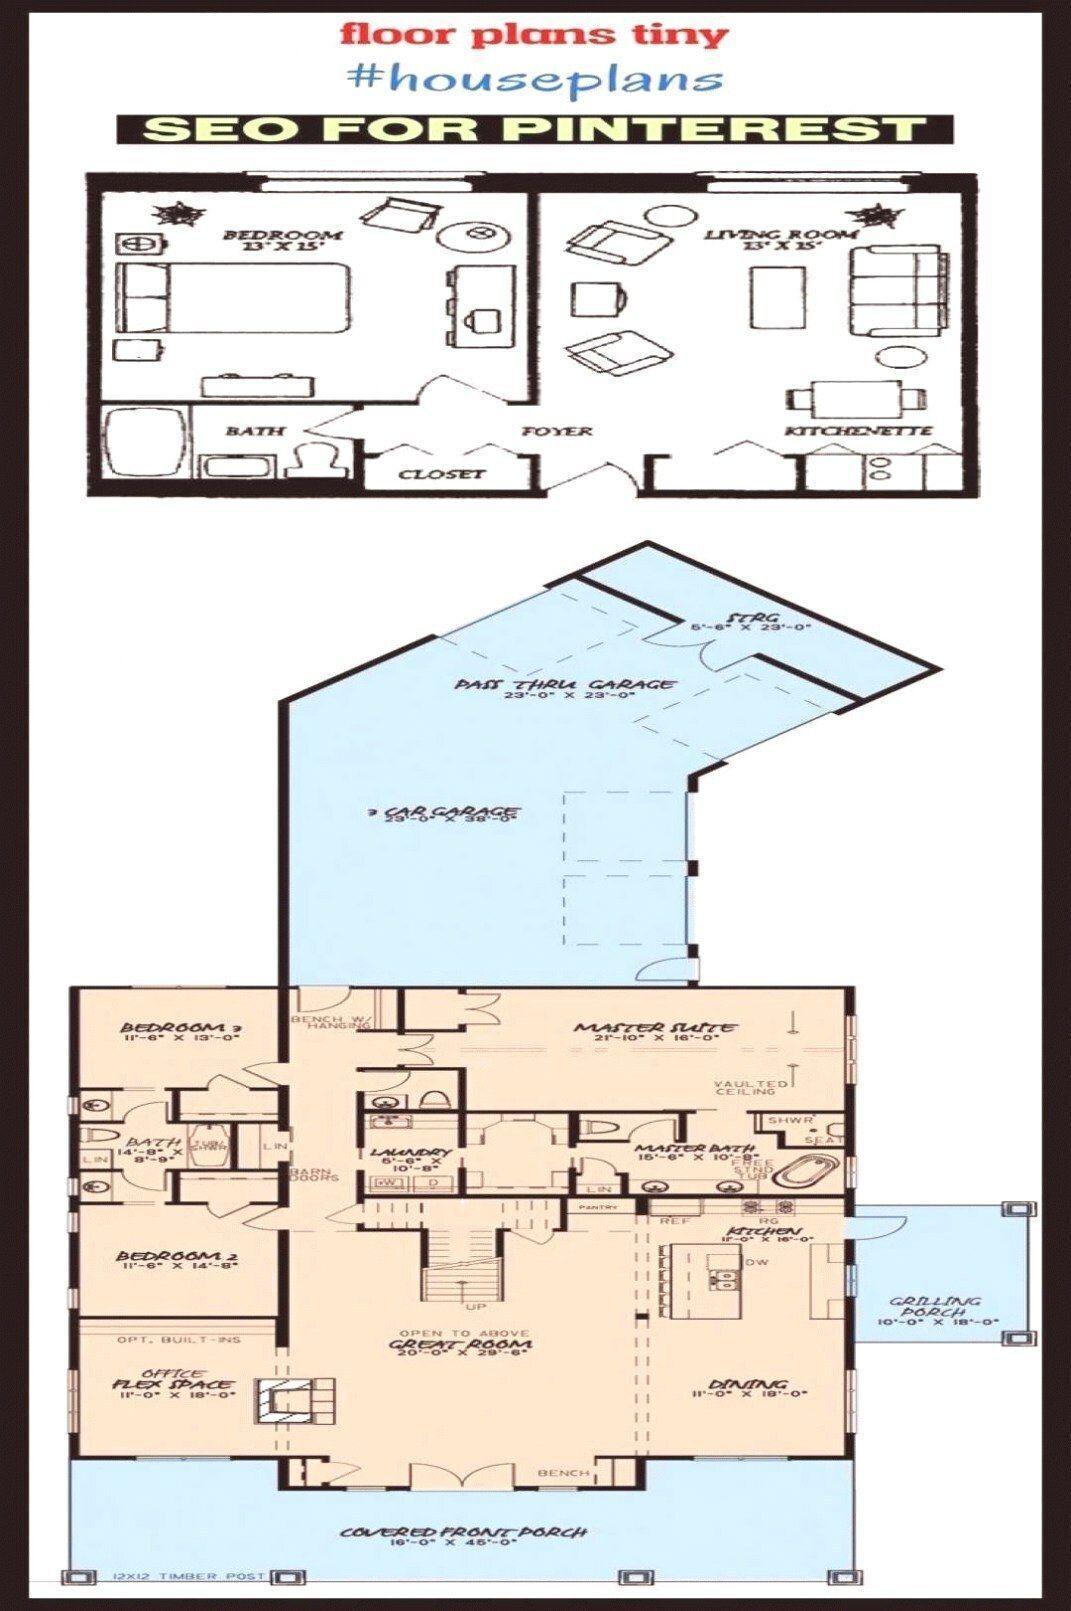 House floor plans 2 story modern house floor plans 2000 sq